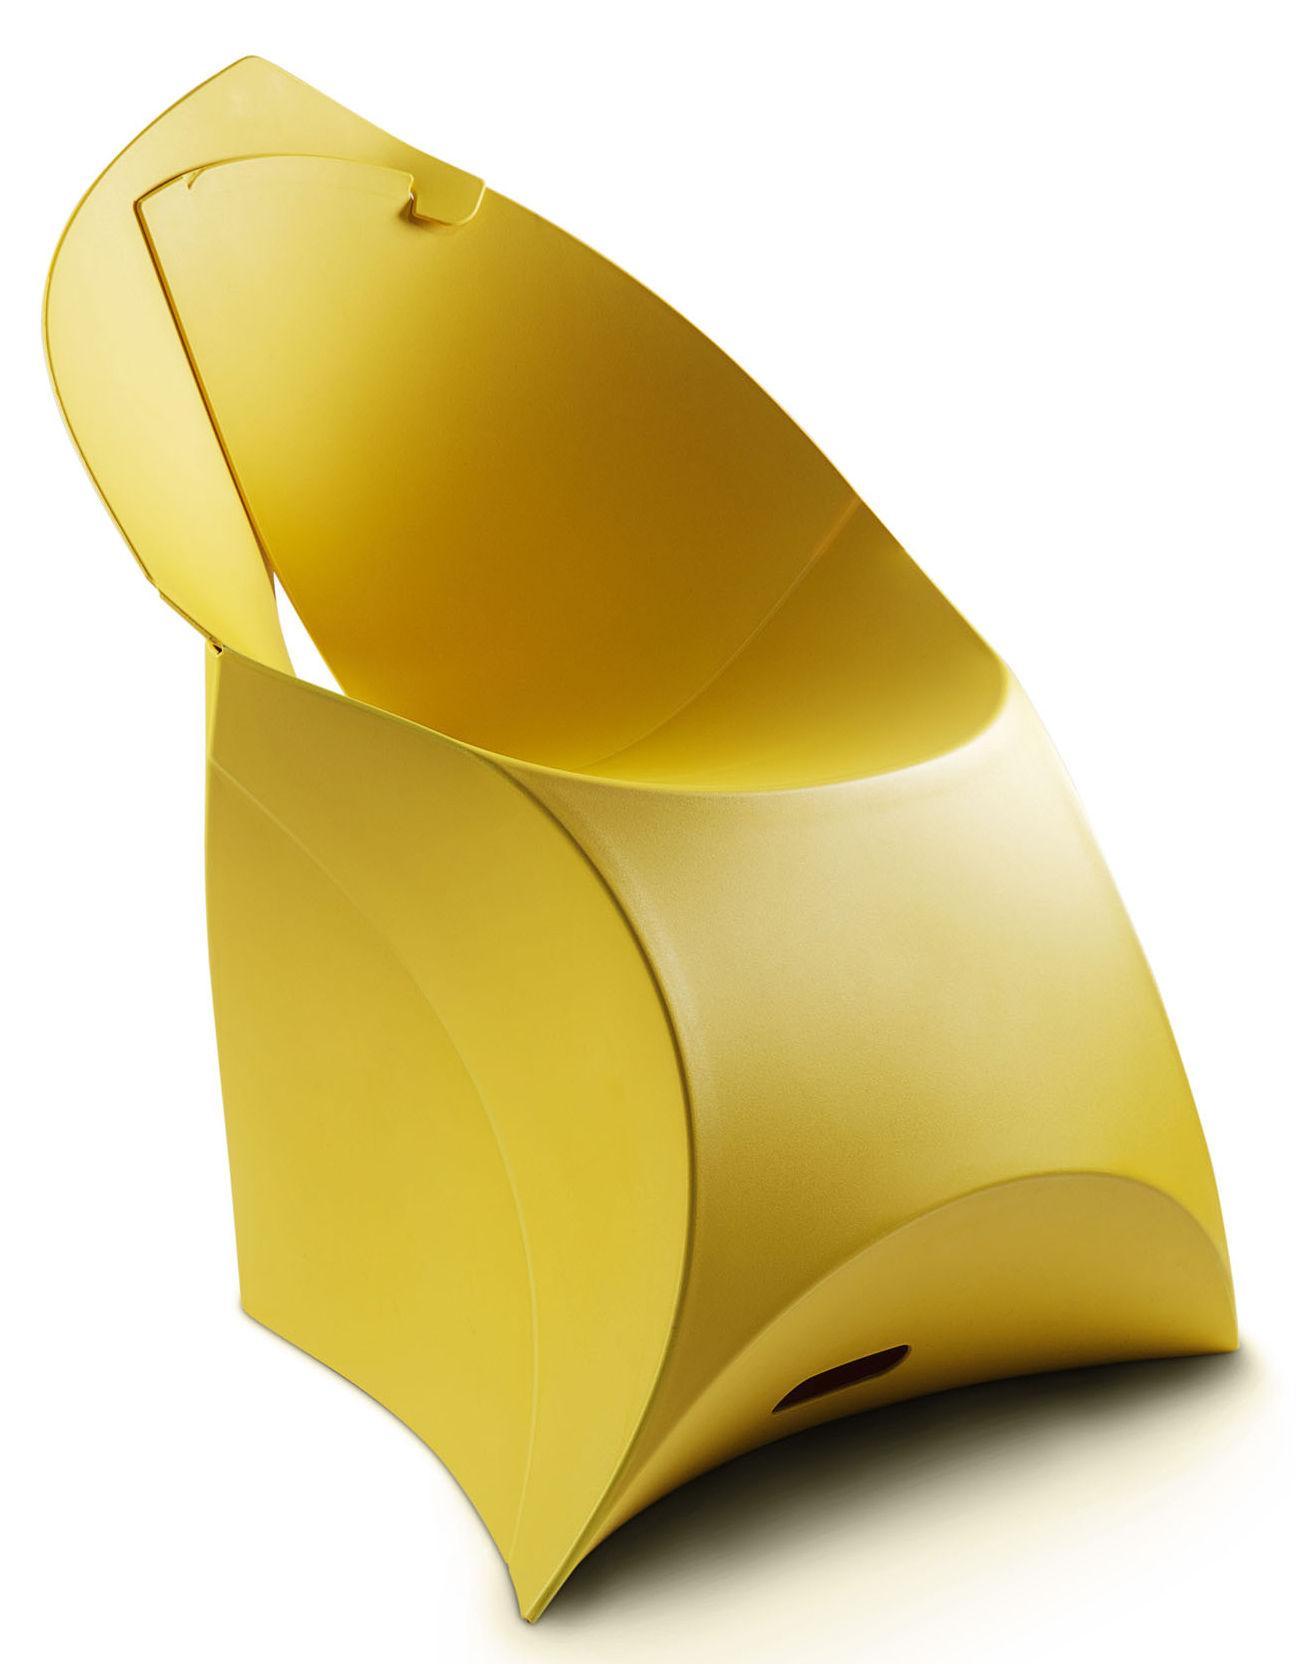 Flux Chair Folding Armchair Polypropylene Yellow By Flux